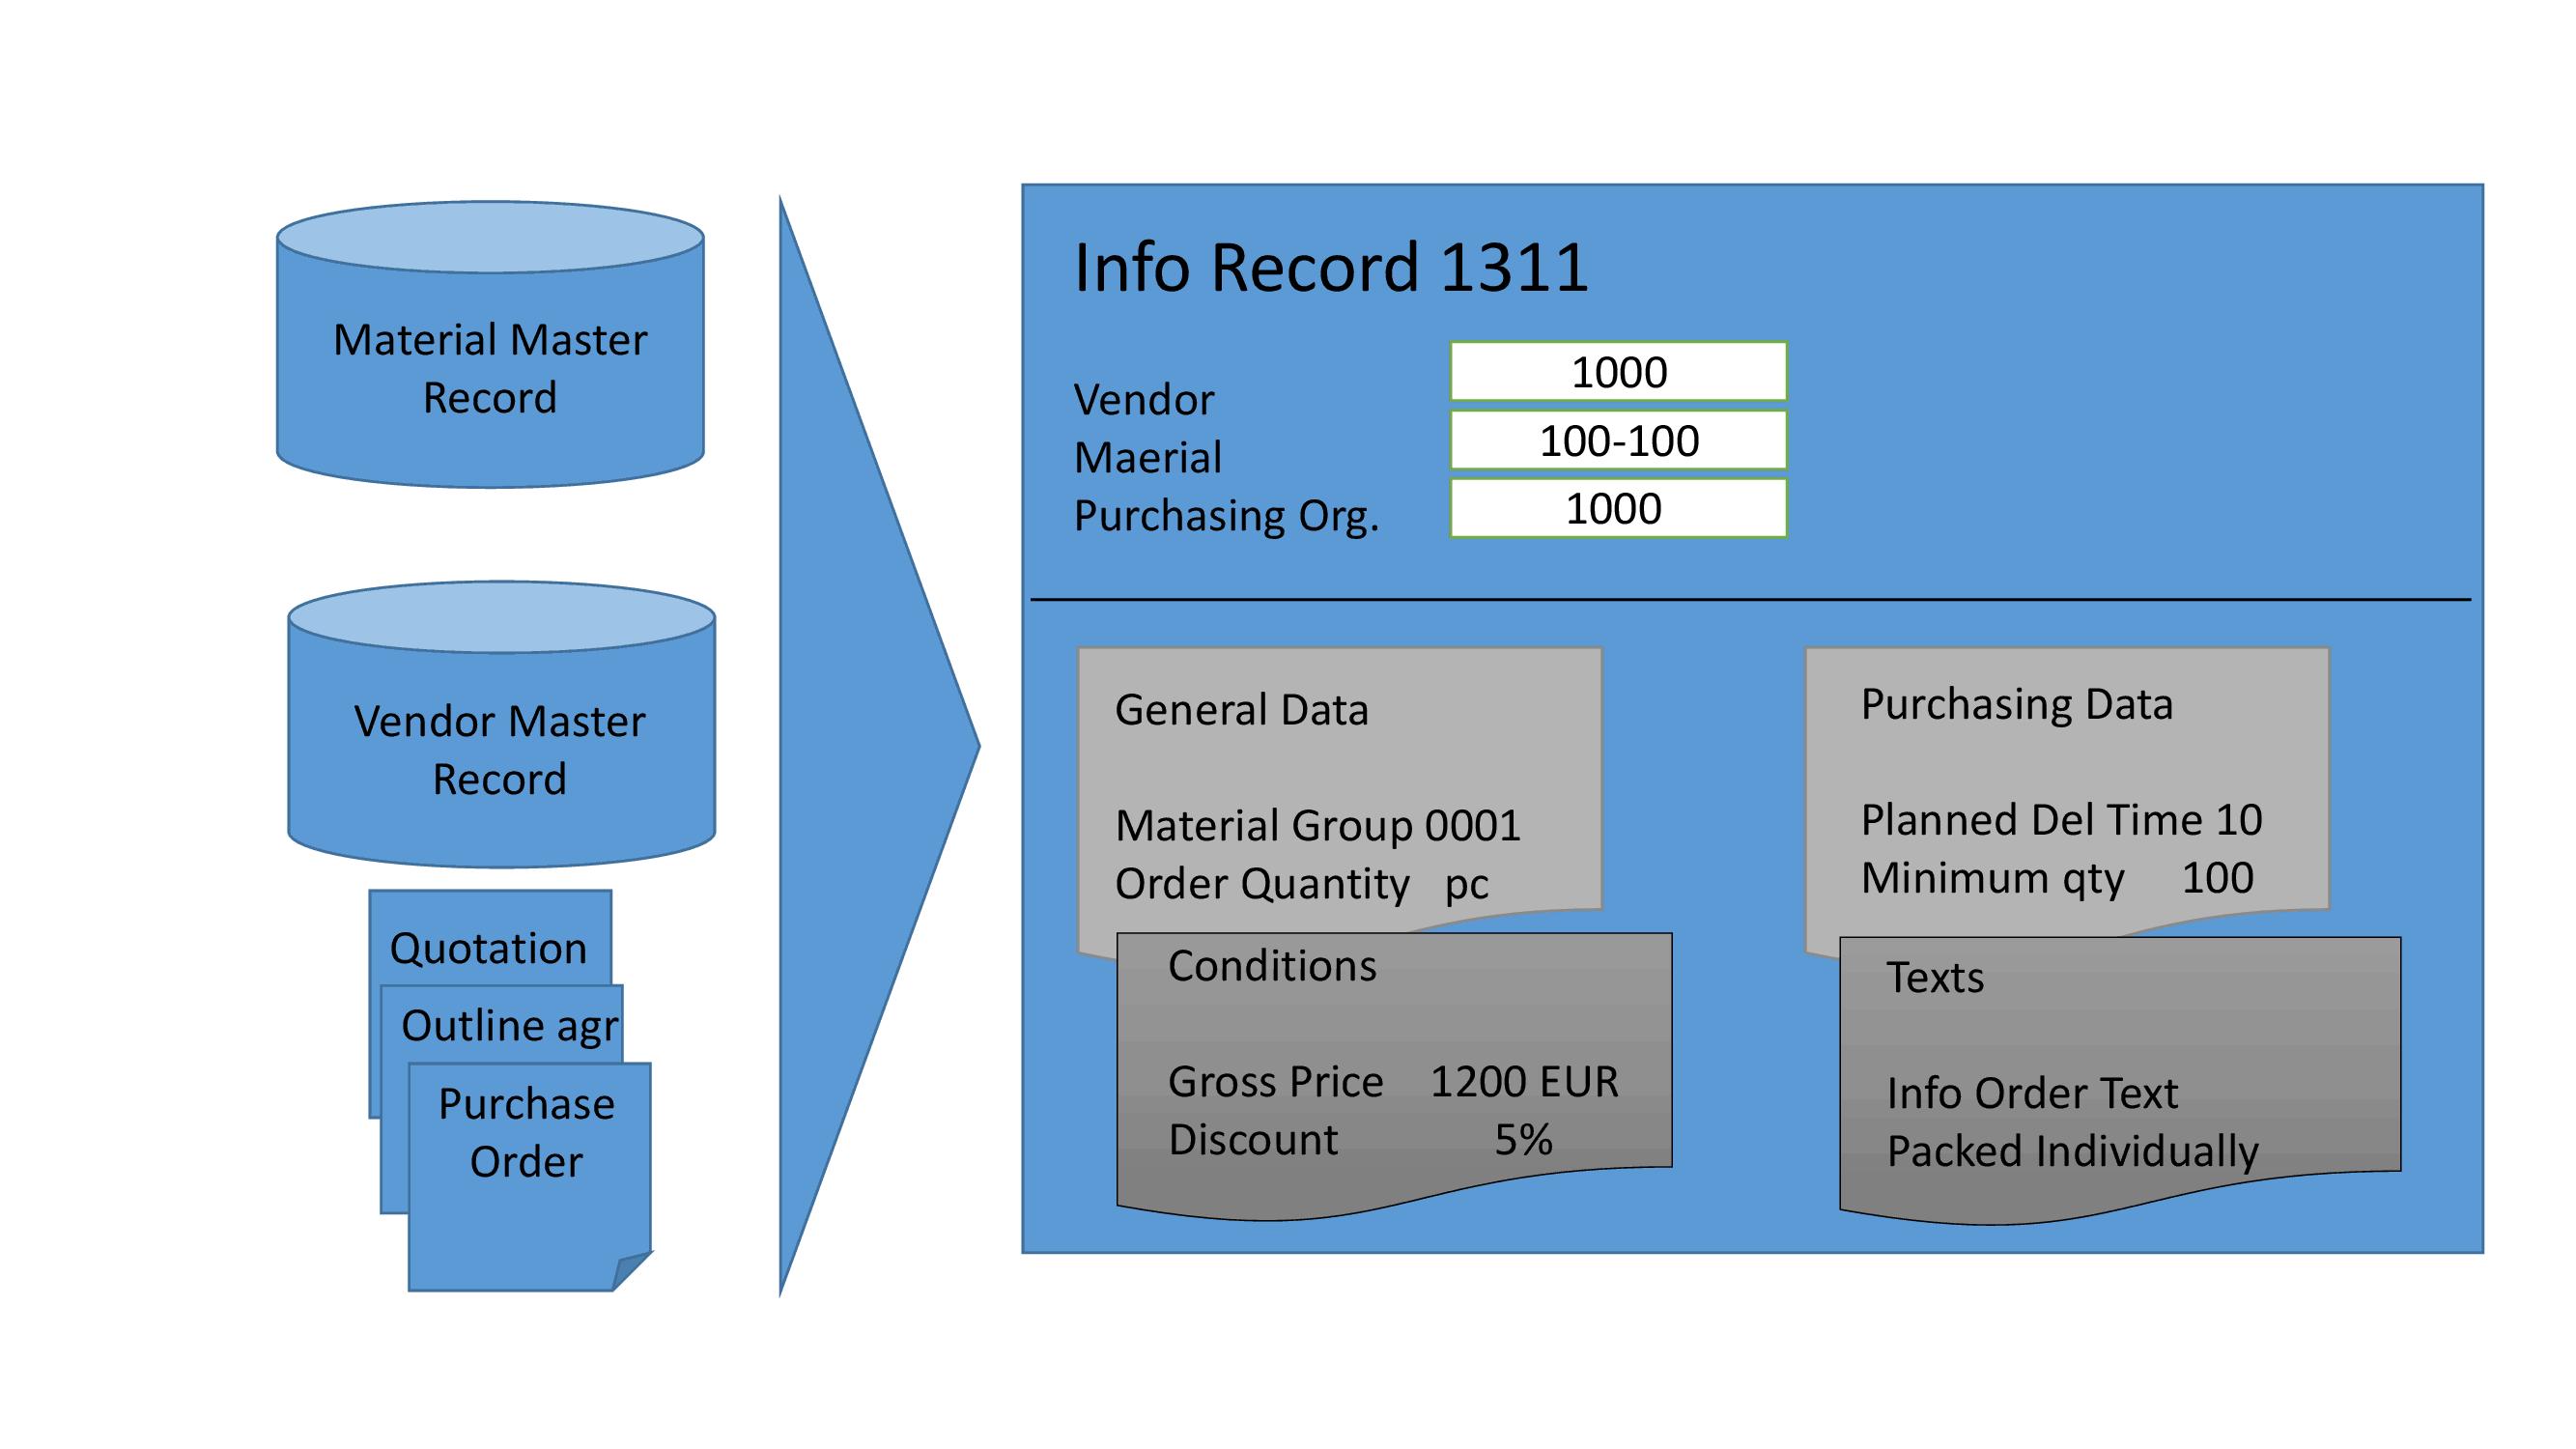 sap purchase info record